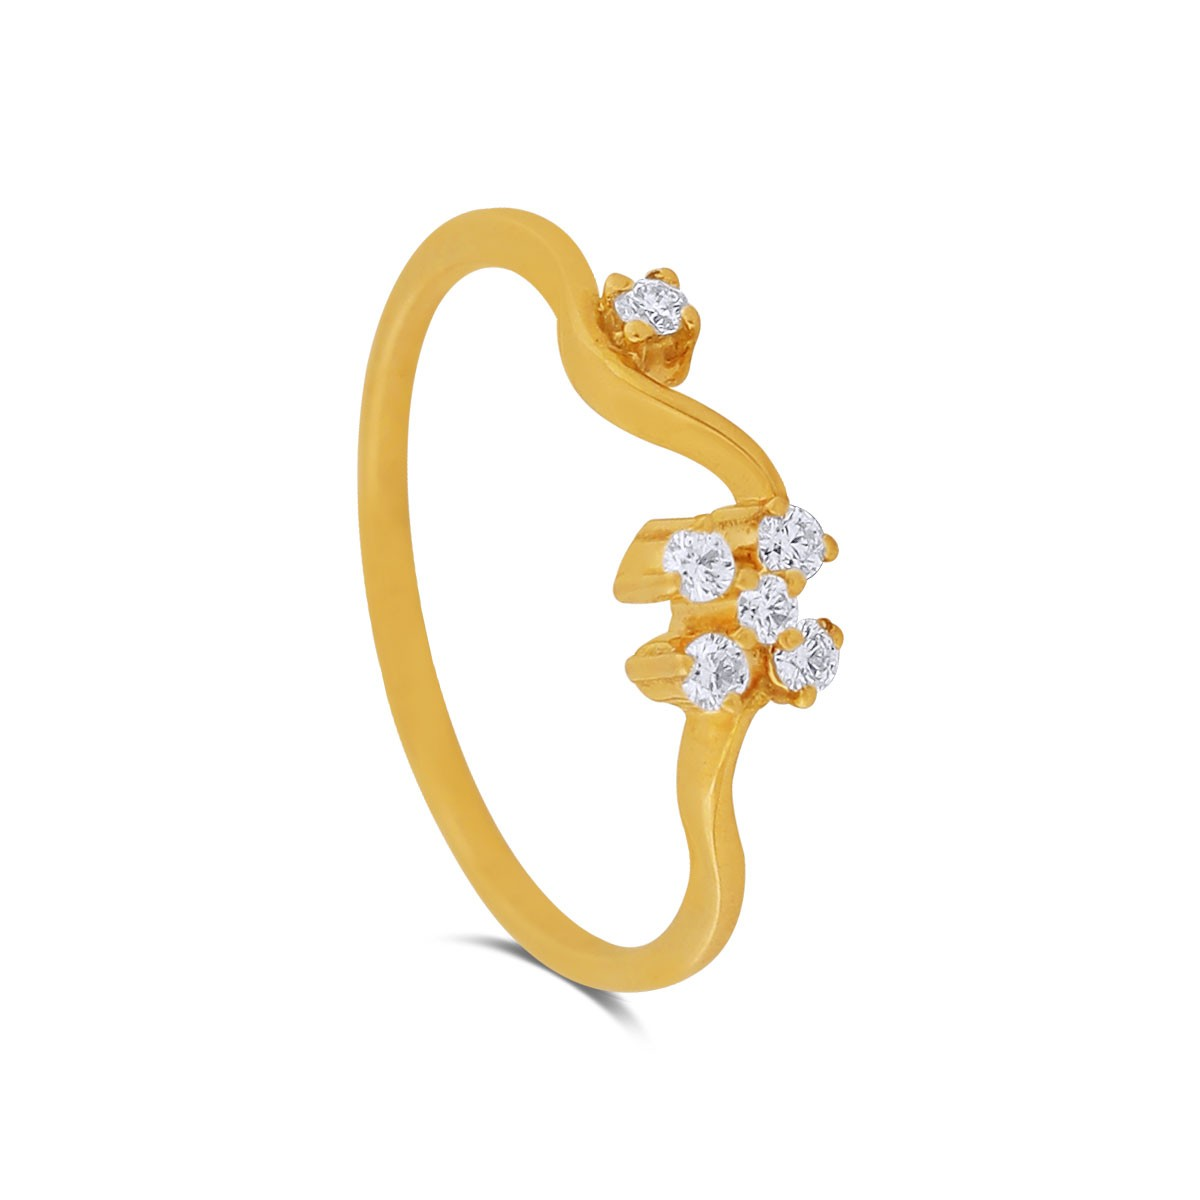 Sydney Yellow Gold Diamond Ring